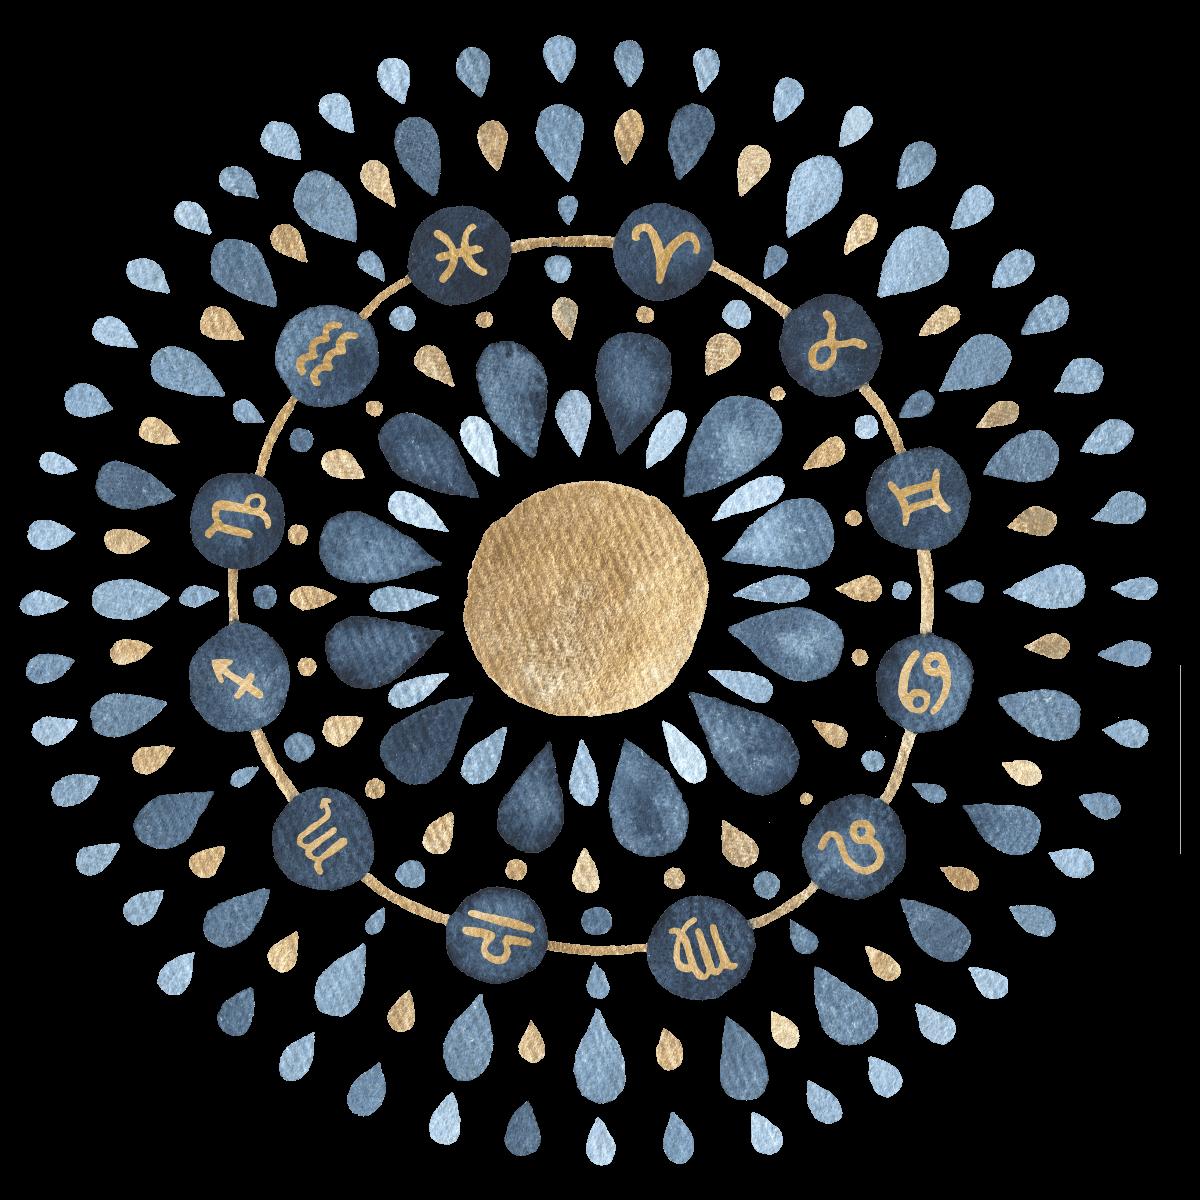 https://marigiova.gr/wp-content/uploads/2021/05/Horoscope-mari.png